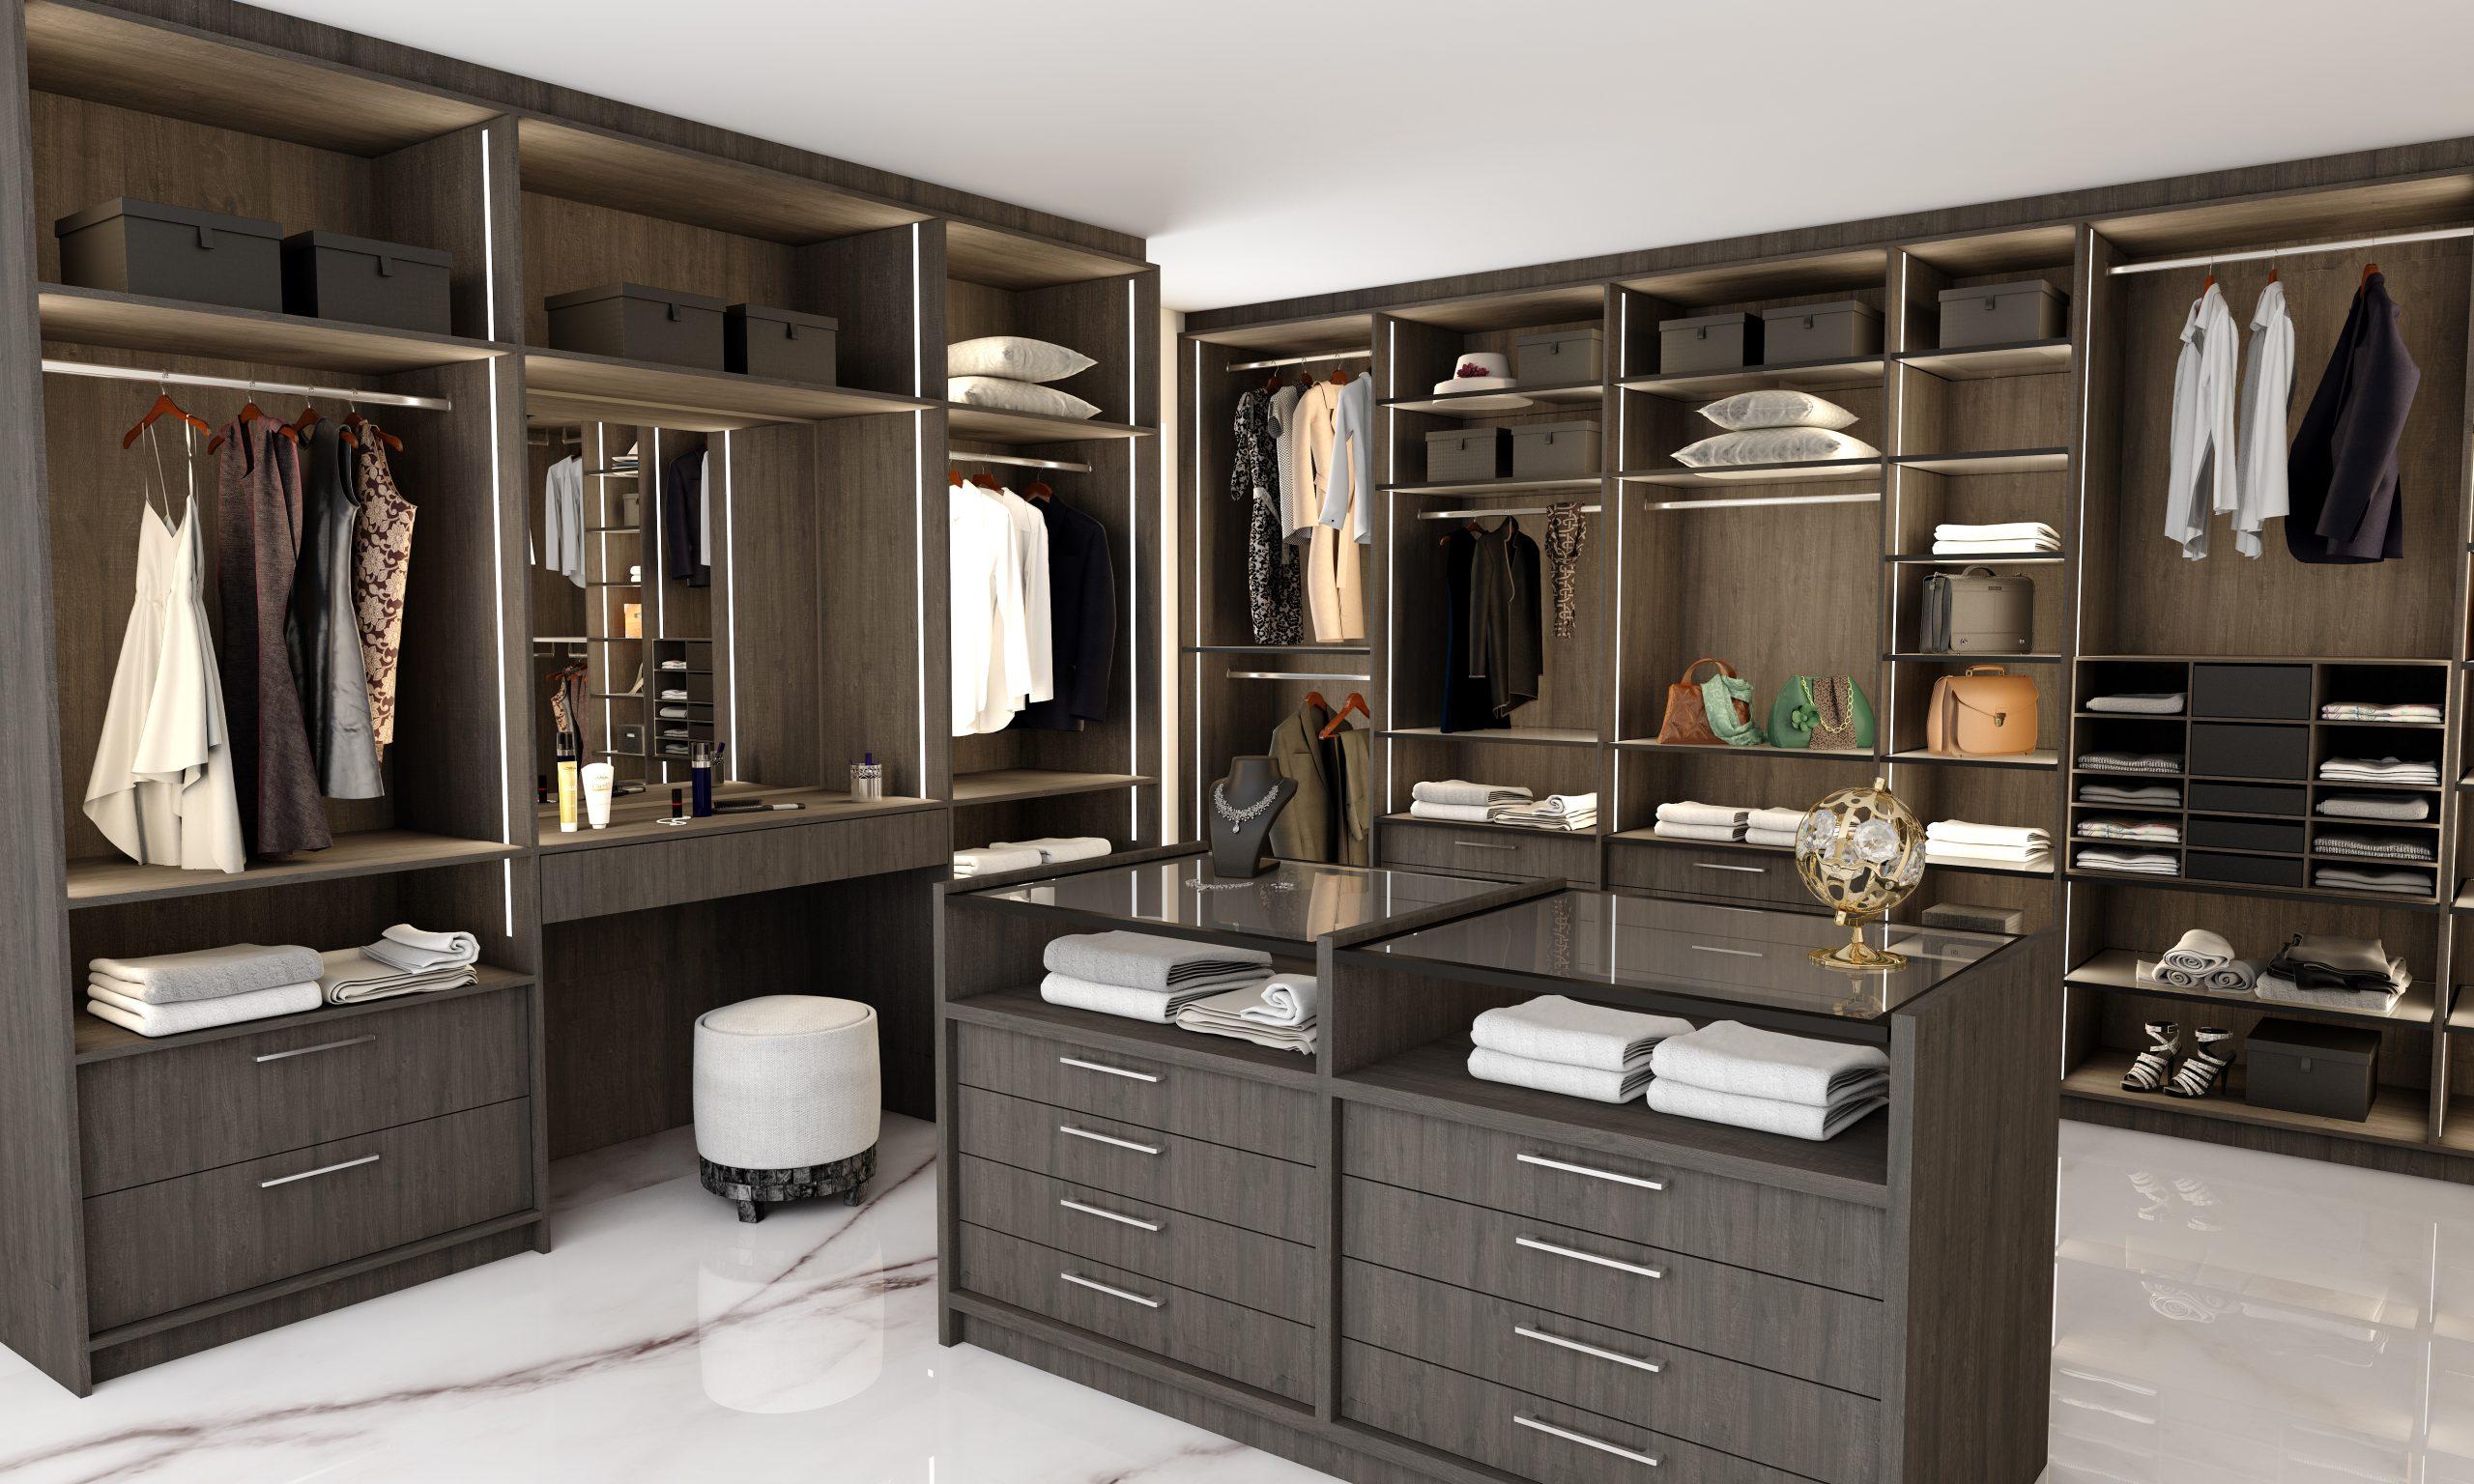 Modern Walk-in Fitted Wardrobe in Dark Walnut Finish With Island and Dresser